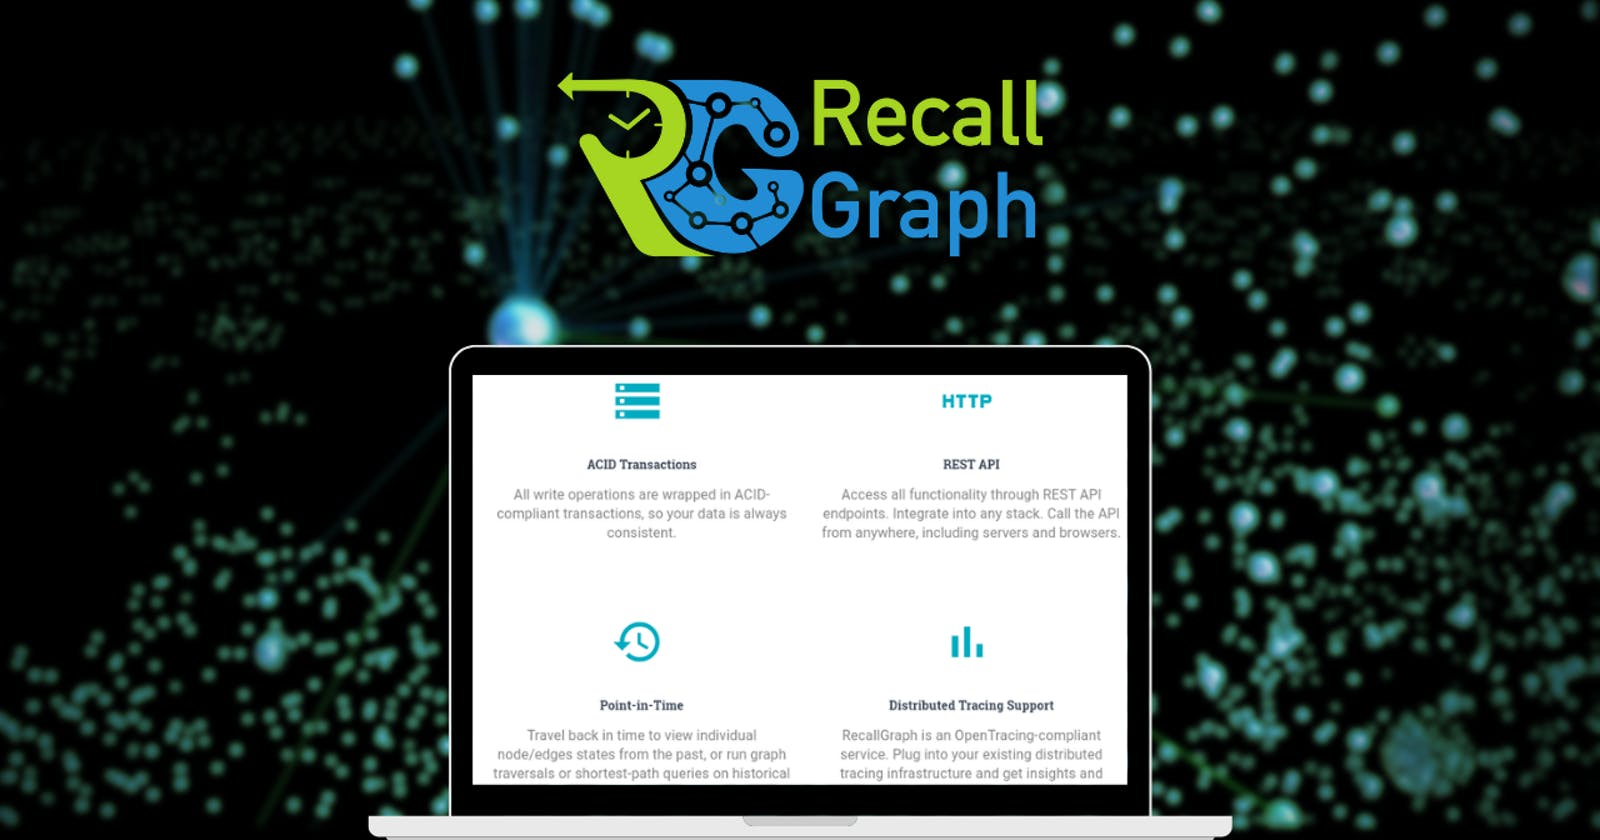 RecallGraph v1 Released